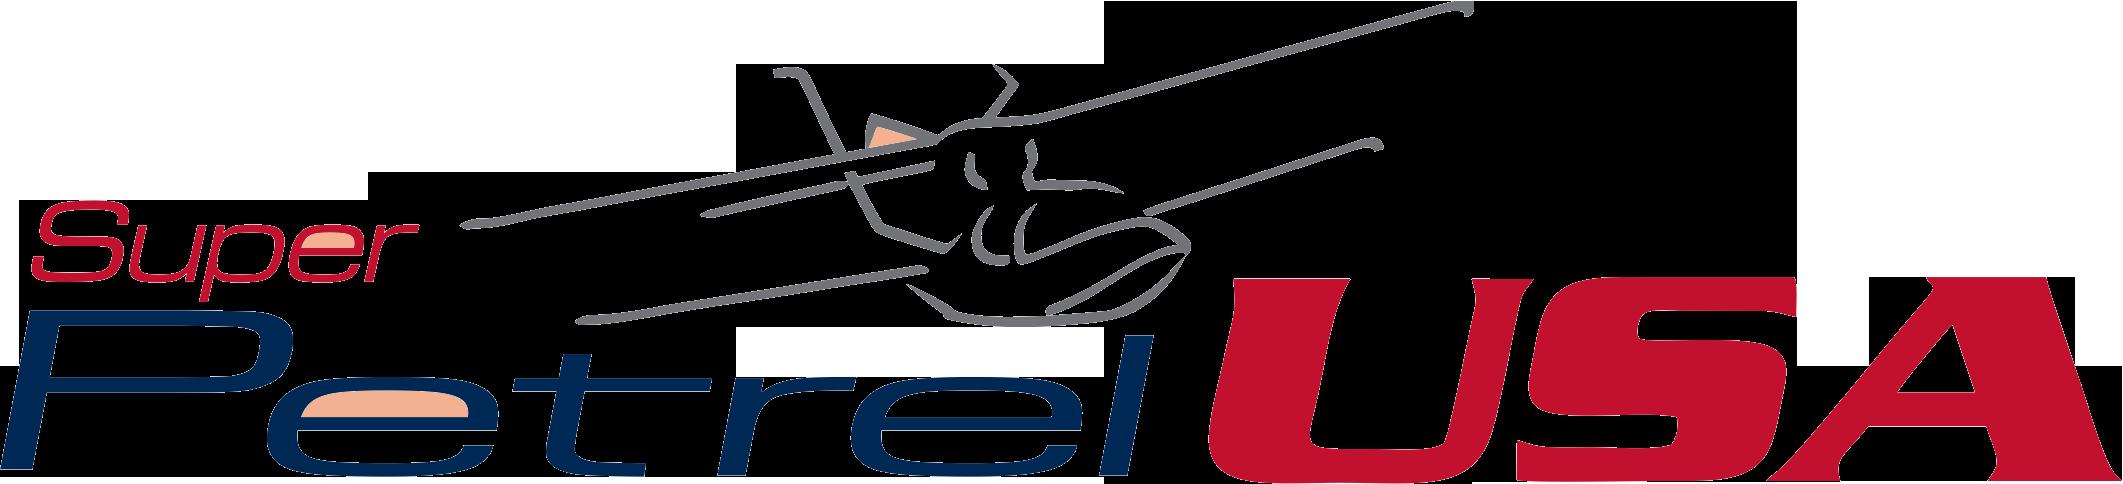 Downloads - Super Petrel USA